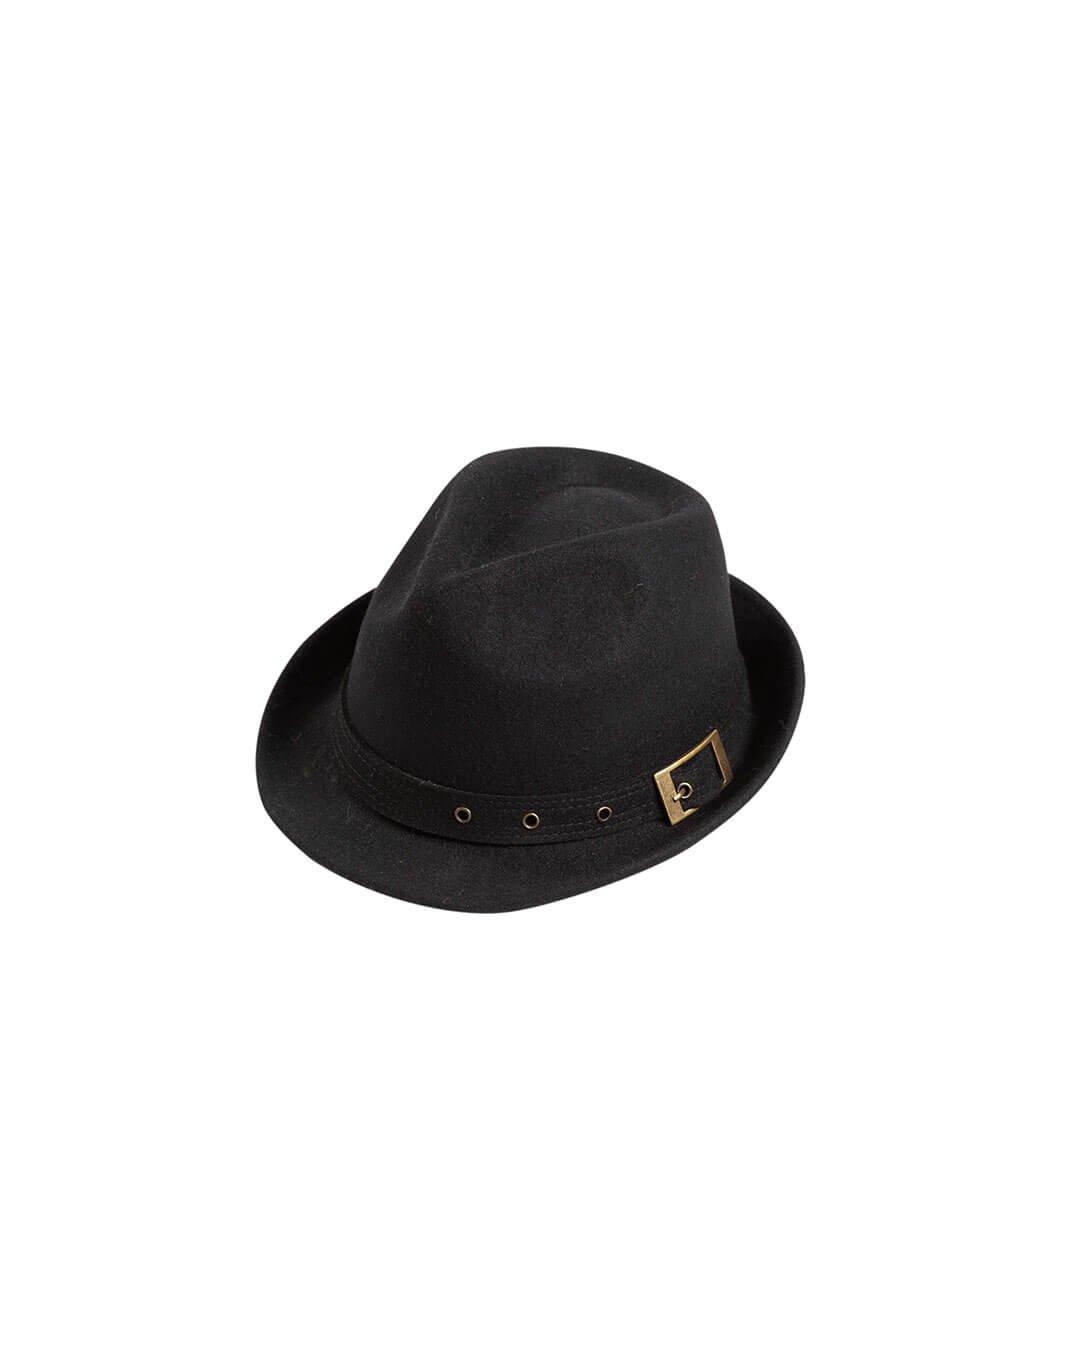 DYW-18-03 - Fötr Şapka - CMF Tekstil